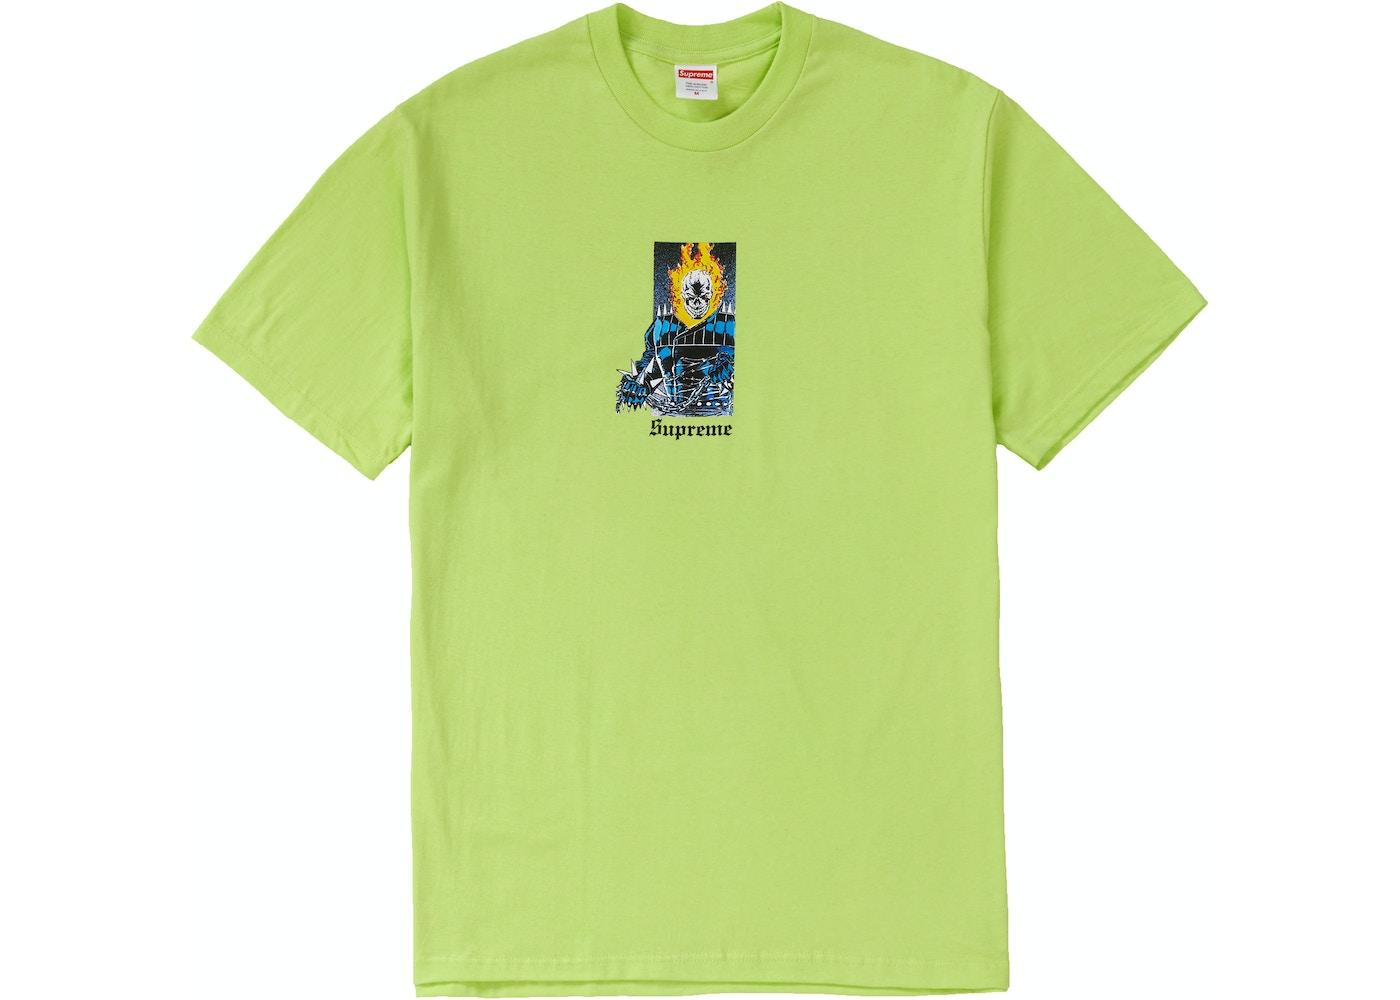 7d2e5260 Supreme Ghost Rider Tee Neon Green - SS19